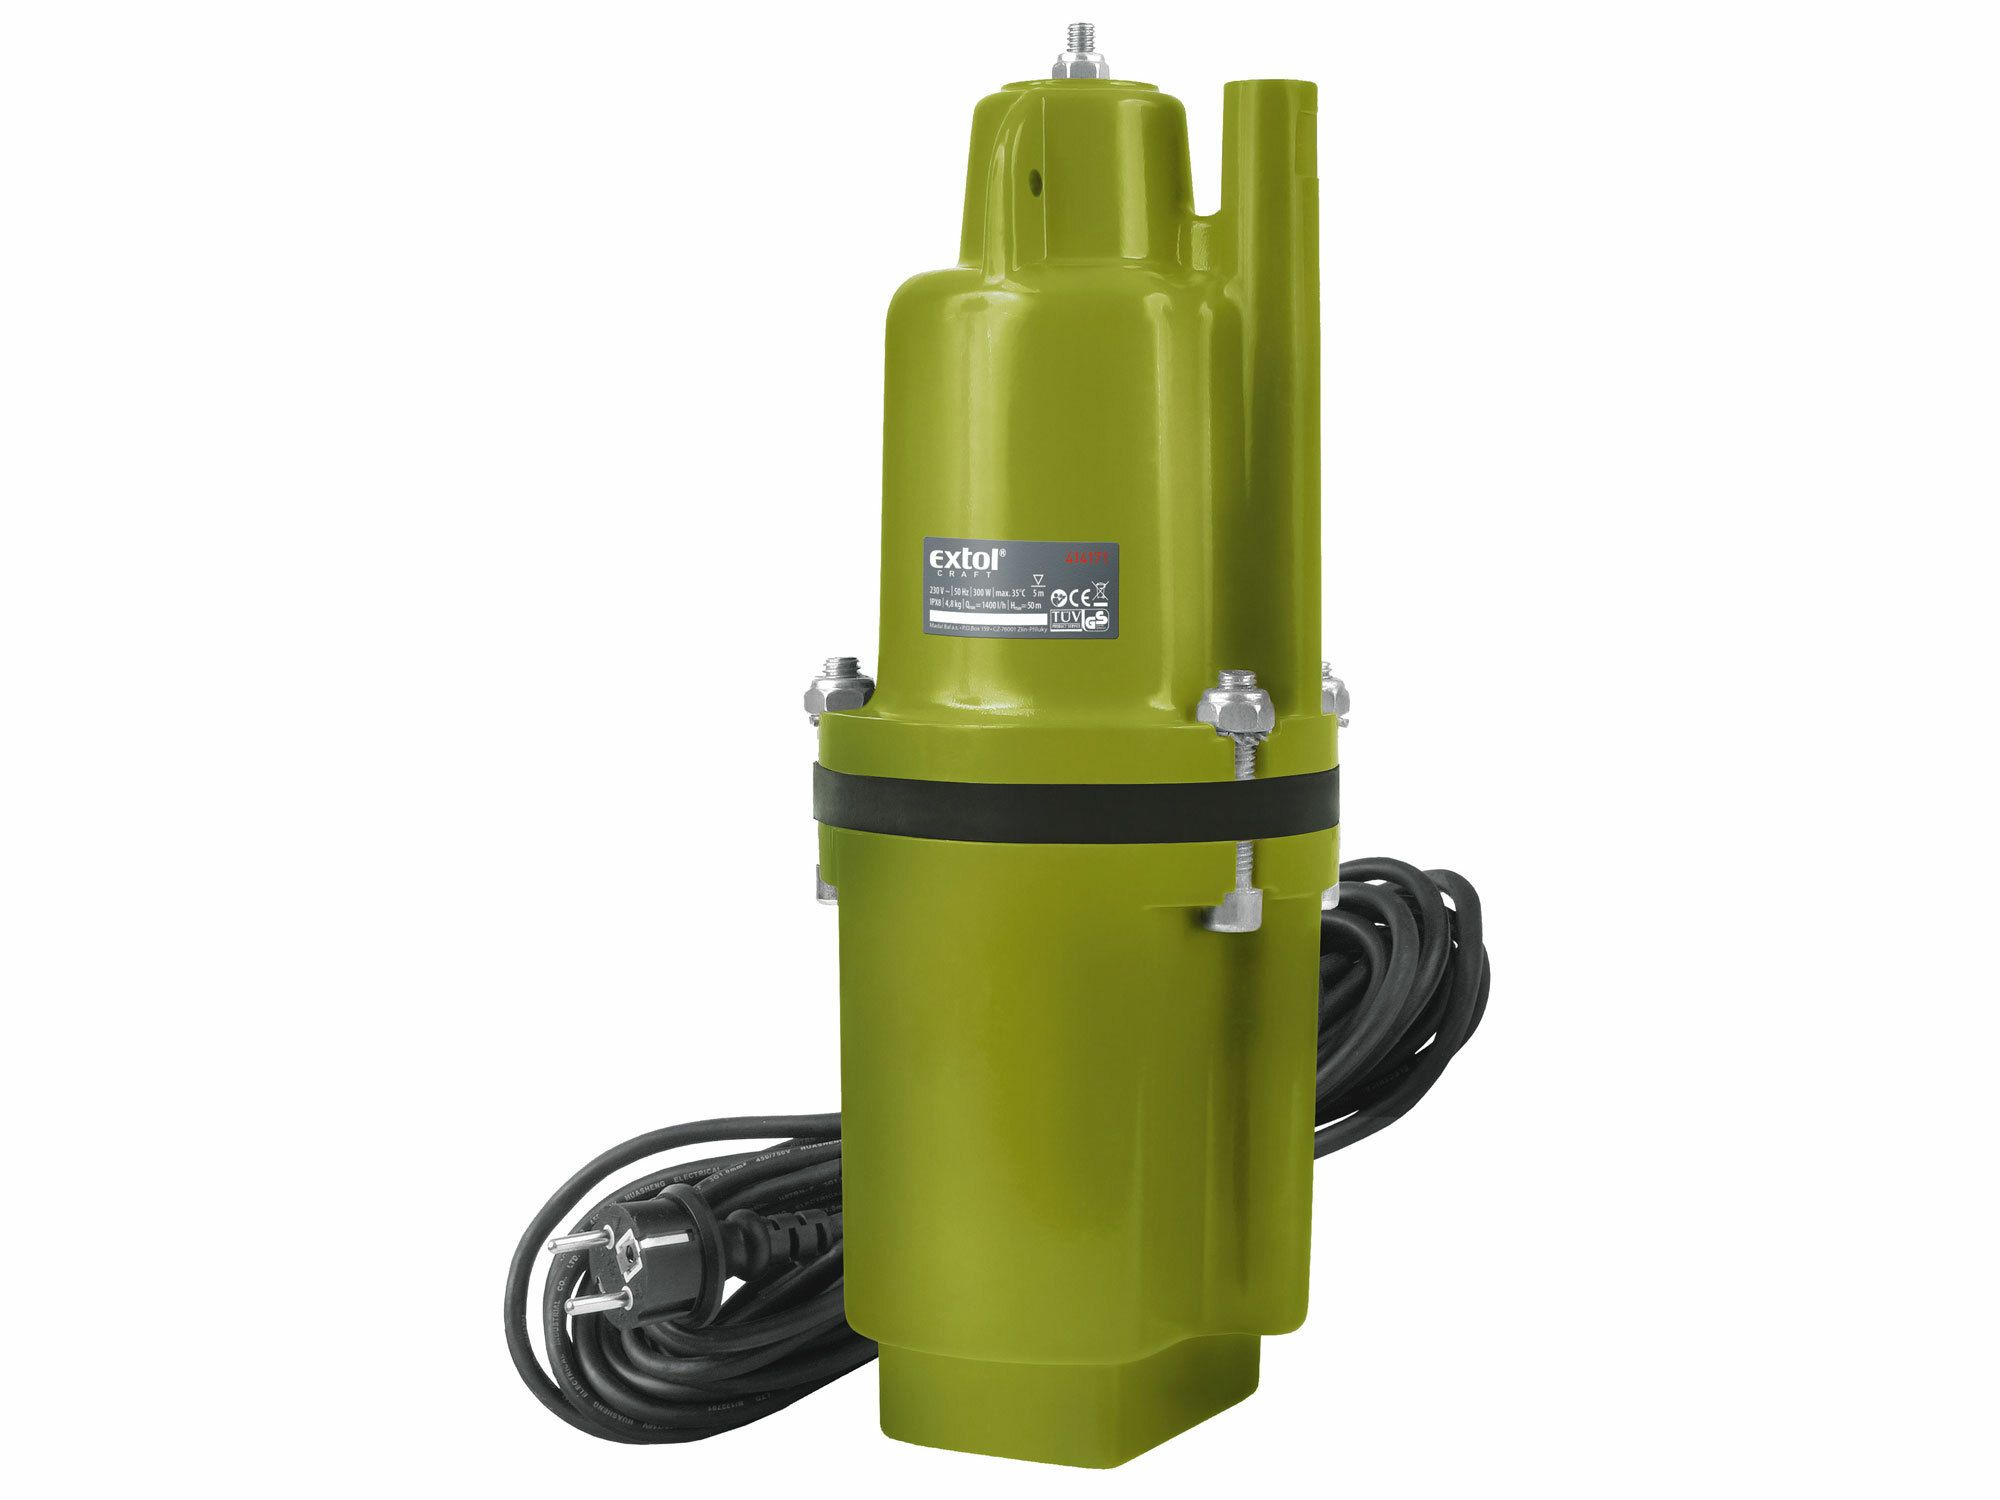 Čerpadlo membránové hlubinné ponorné, 300W, 1400l/hod, 20m EXTOL-CRAFT